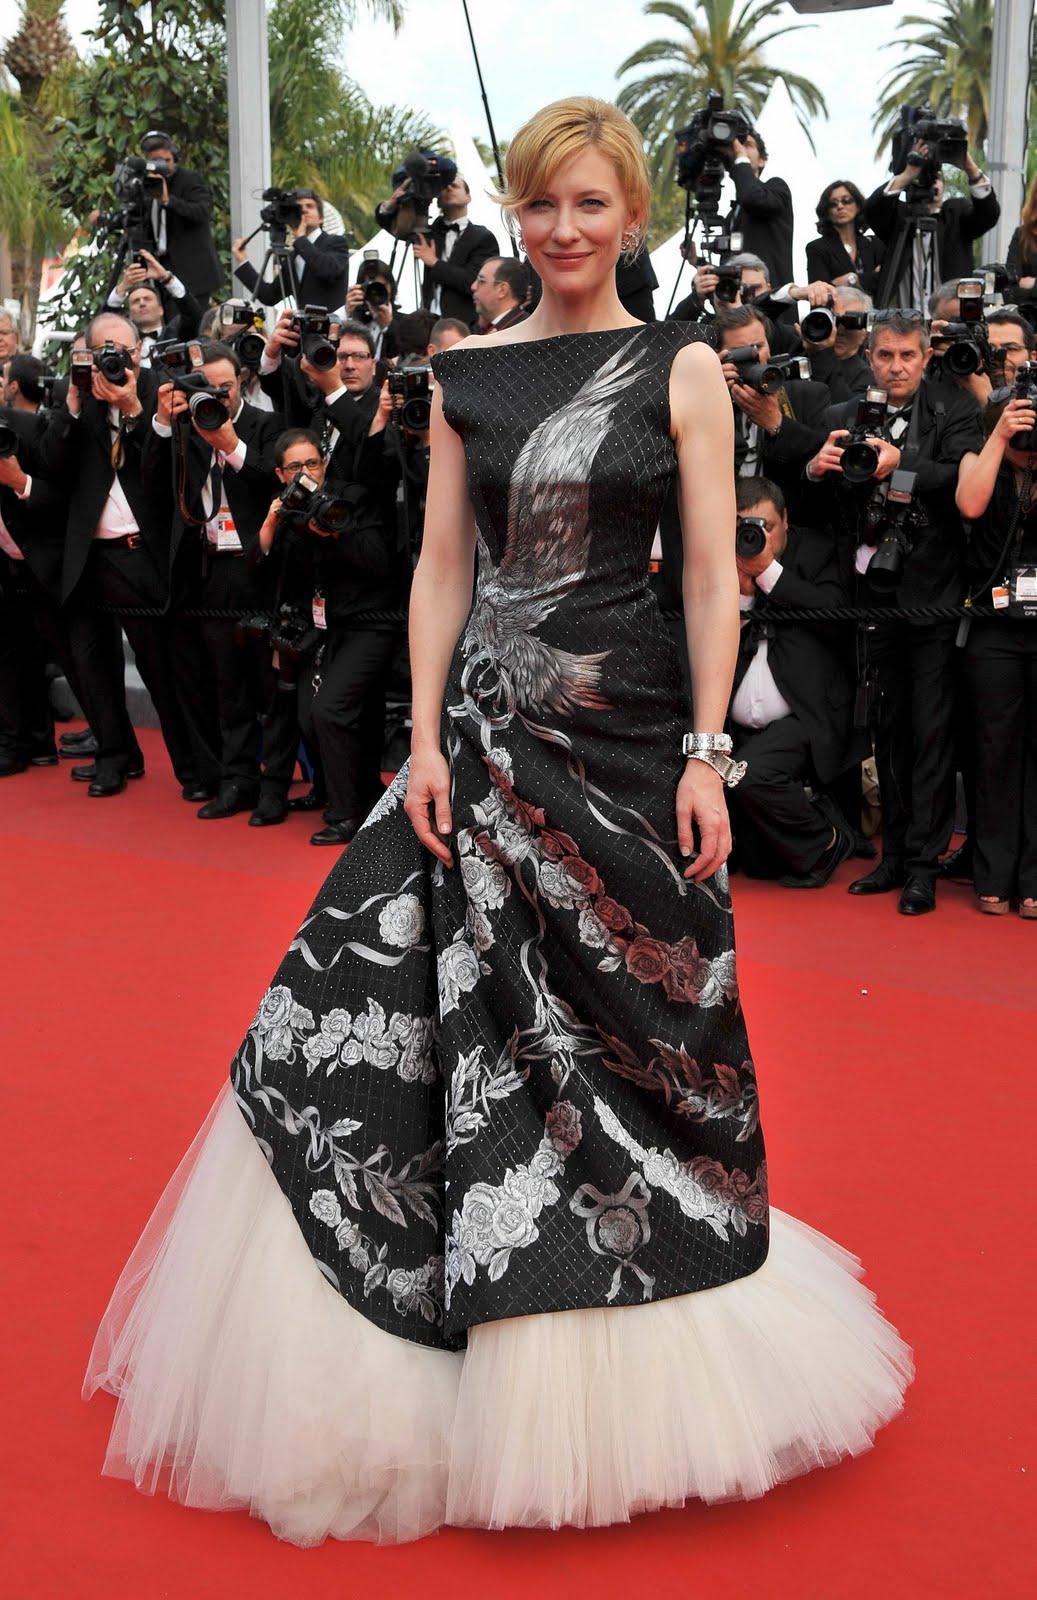 http://4.bp.blogspot.com/_3aCqbXT3pBc/TLk1fNEYnwI/AAAAAAAAAC8/er5YH6yY3J0/s1600/Cate+Blanchett7.jpg